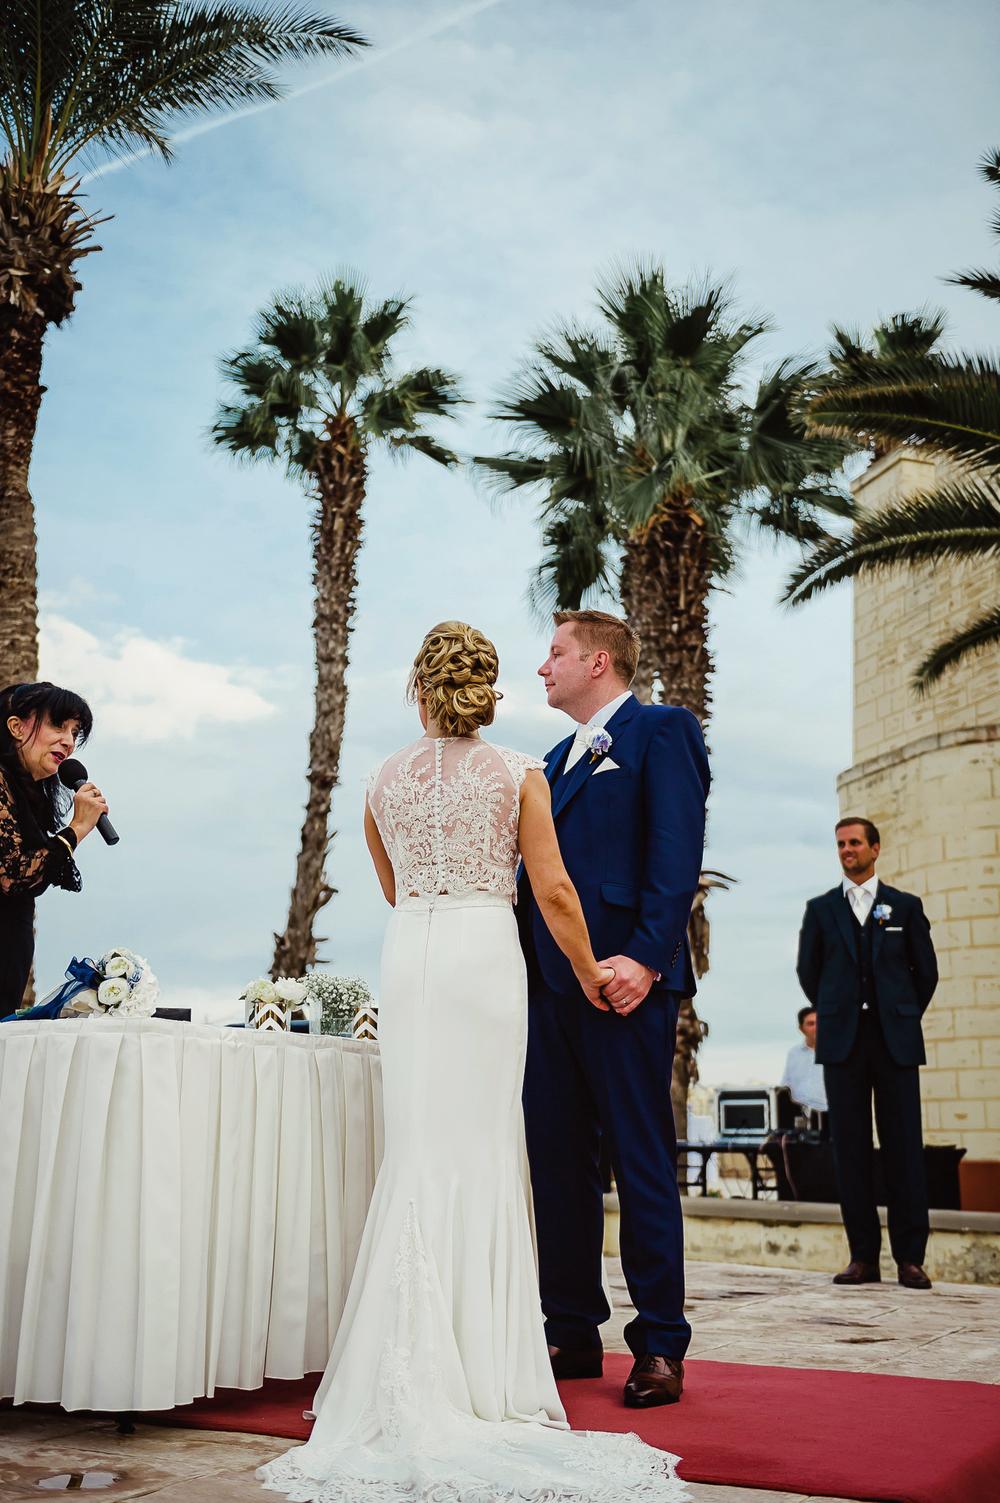 Wedding at The Hilton Malta - Shane P. Watts Photography